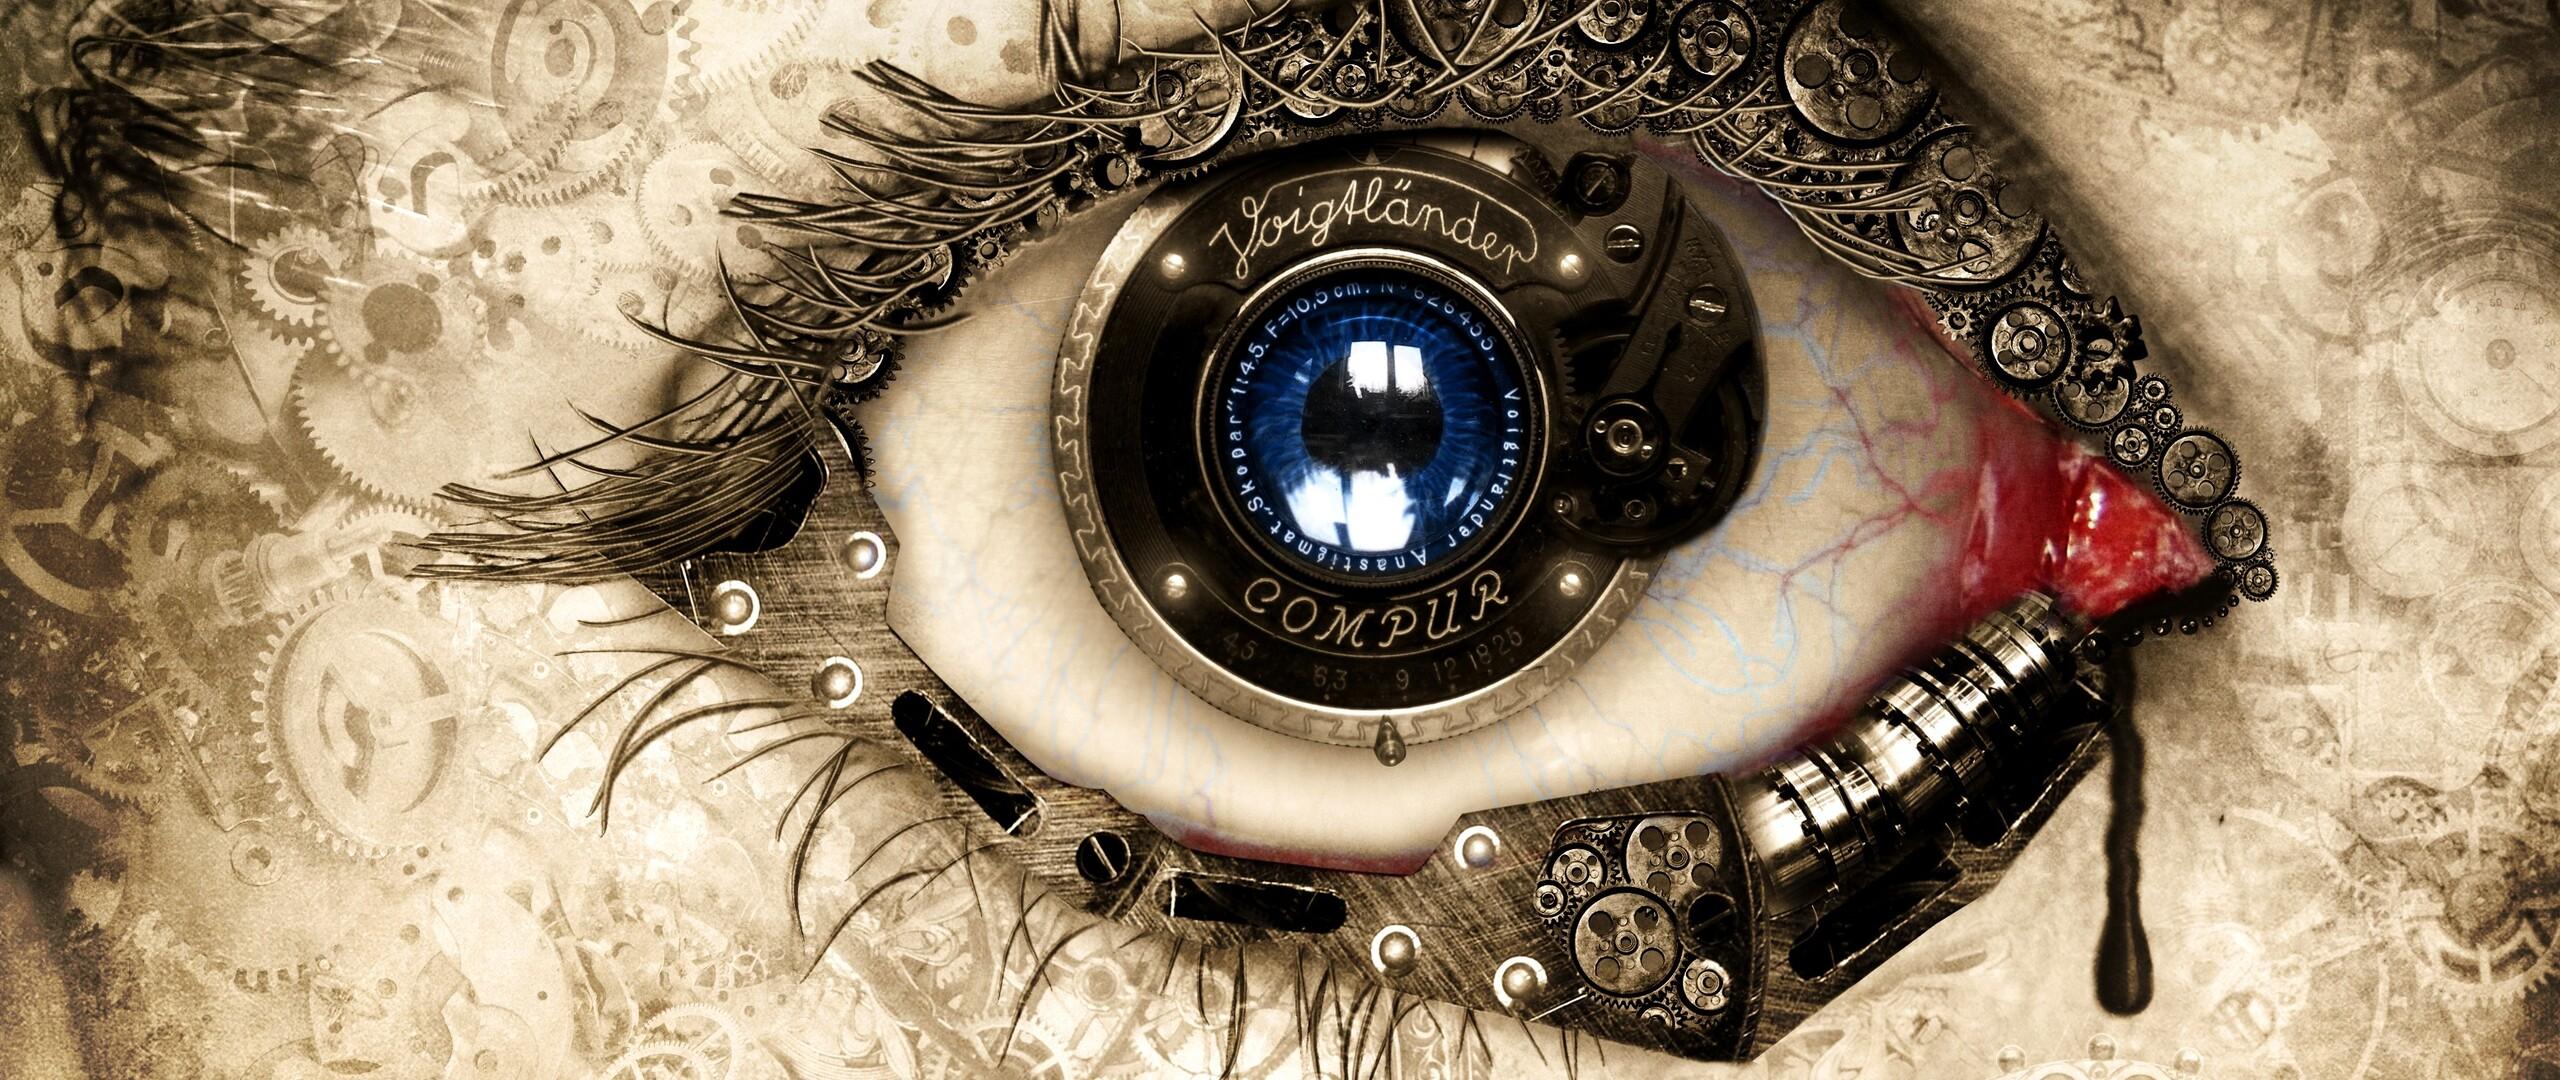 Eye photo manipulation tutorial Glowing Lines Photoshop Tutorial - Photo Extremist